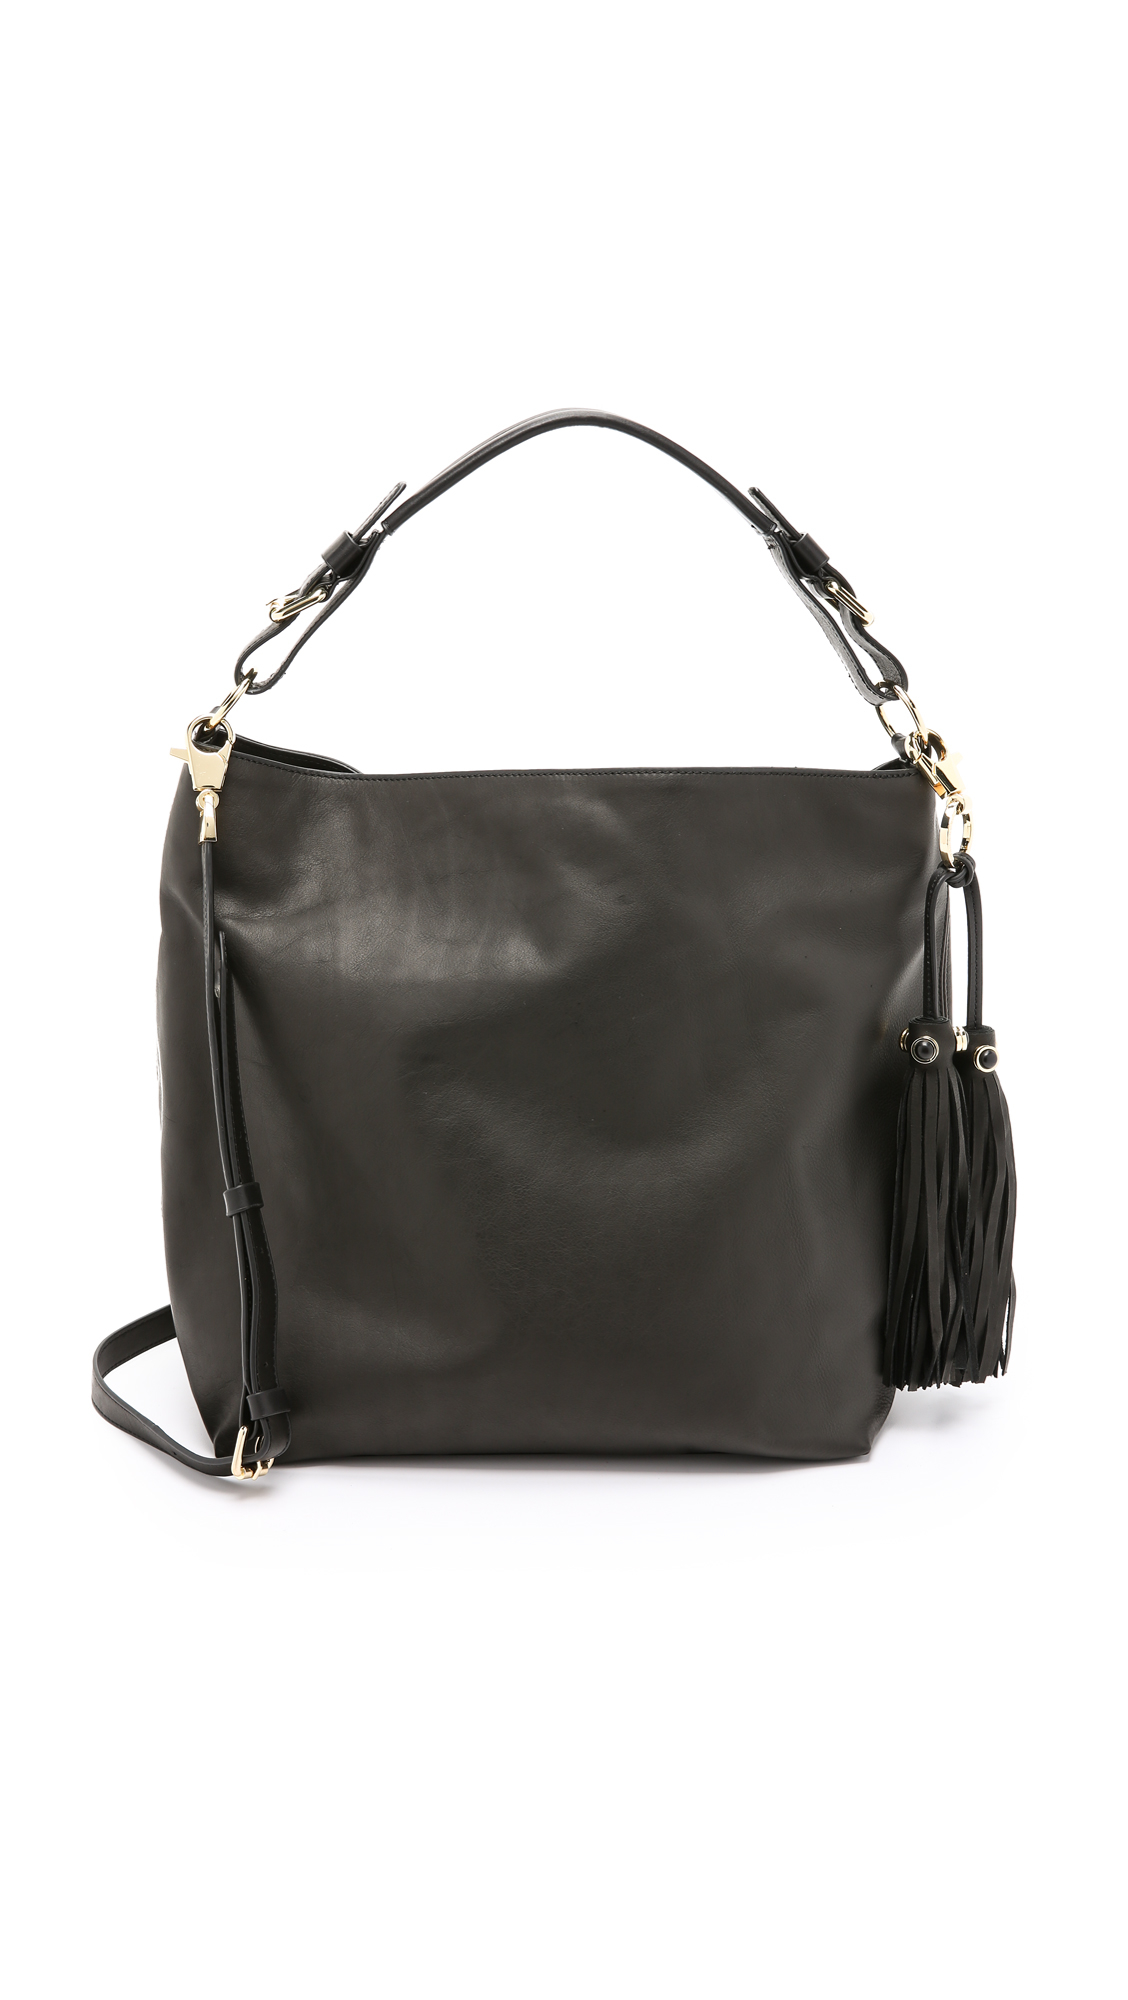 Cynthia Rowley Black Leather Handbags - Handbag Photos Eleventyone.Org a2c5e24b770f1